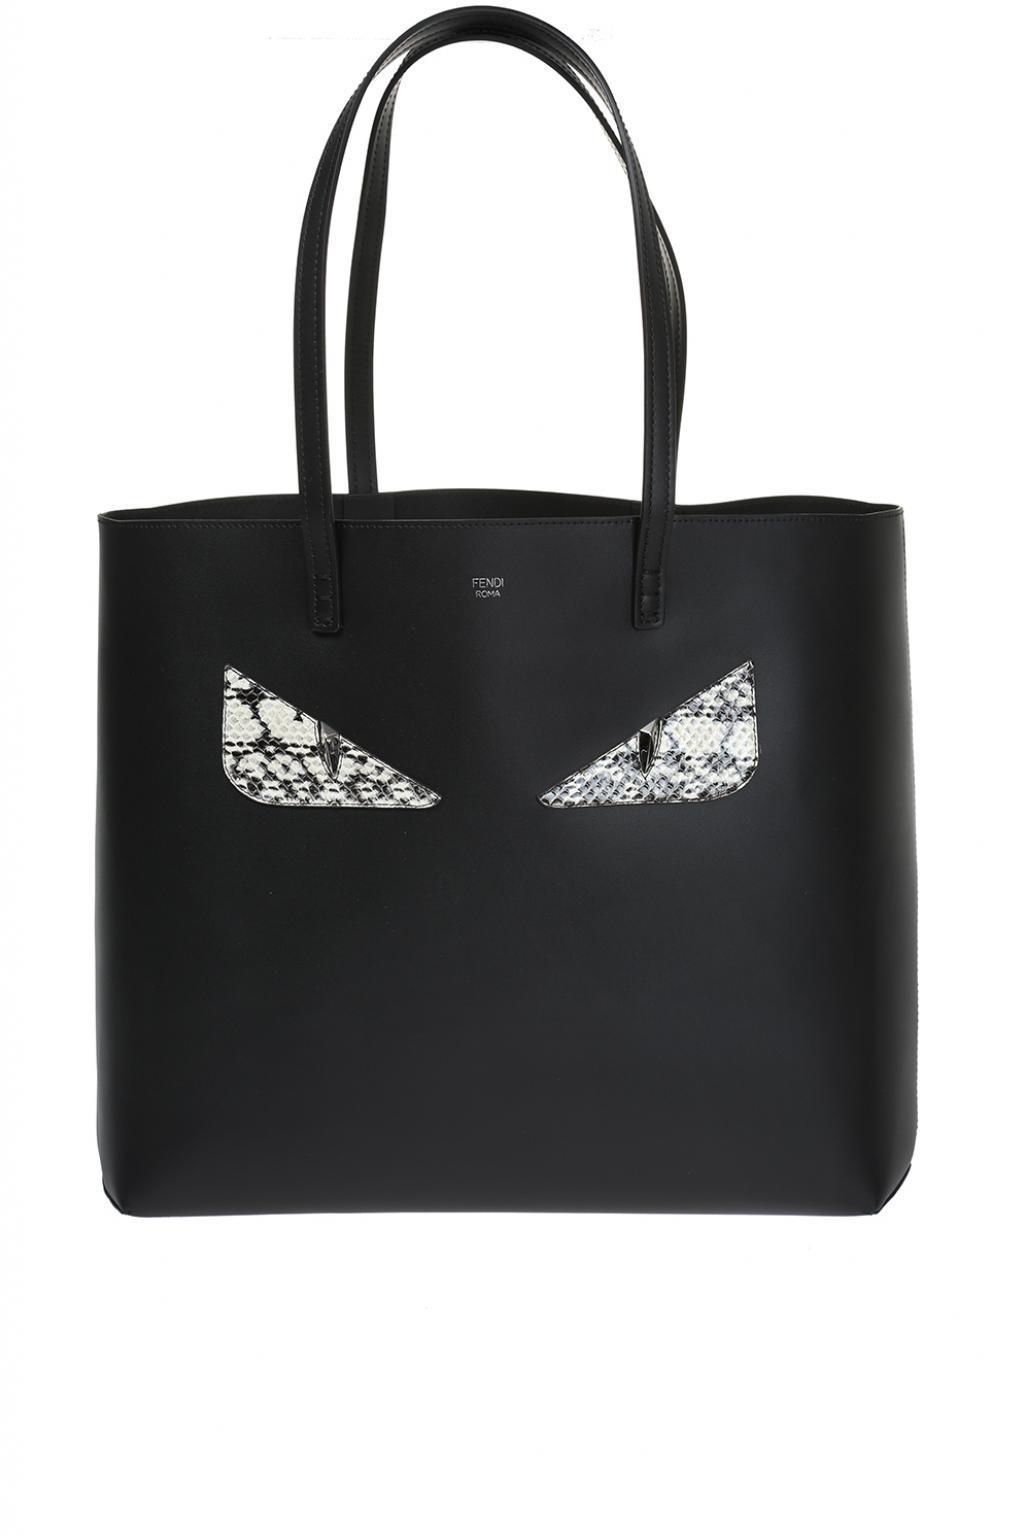 Fendi  roll  Shopper Bag in Black - Lyst 1f4d1ba1dfed6